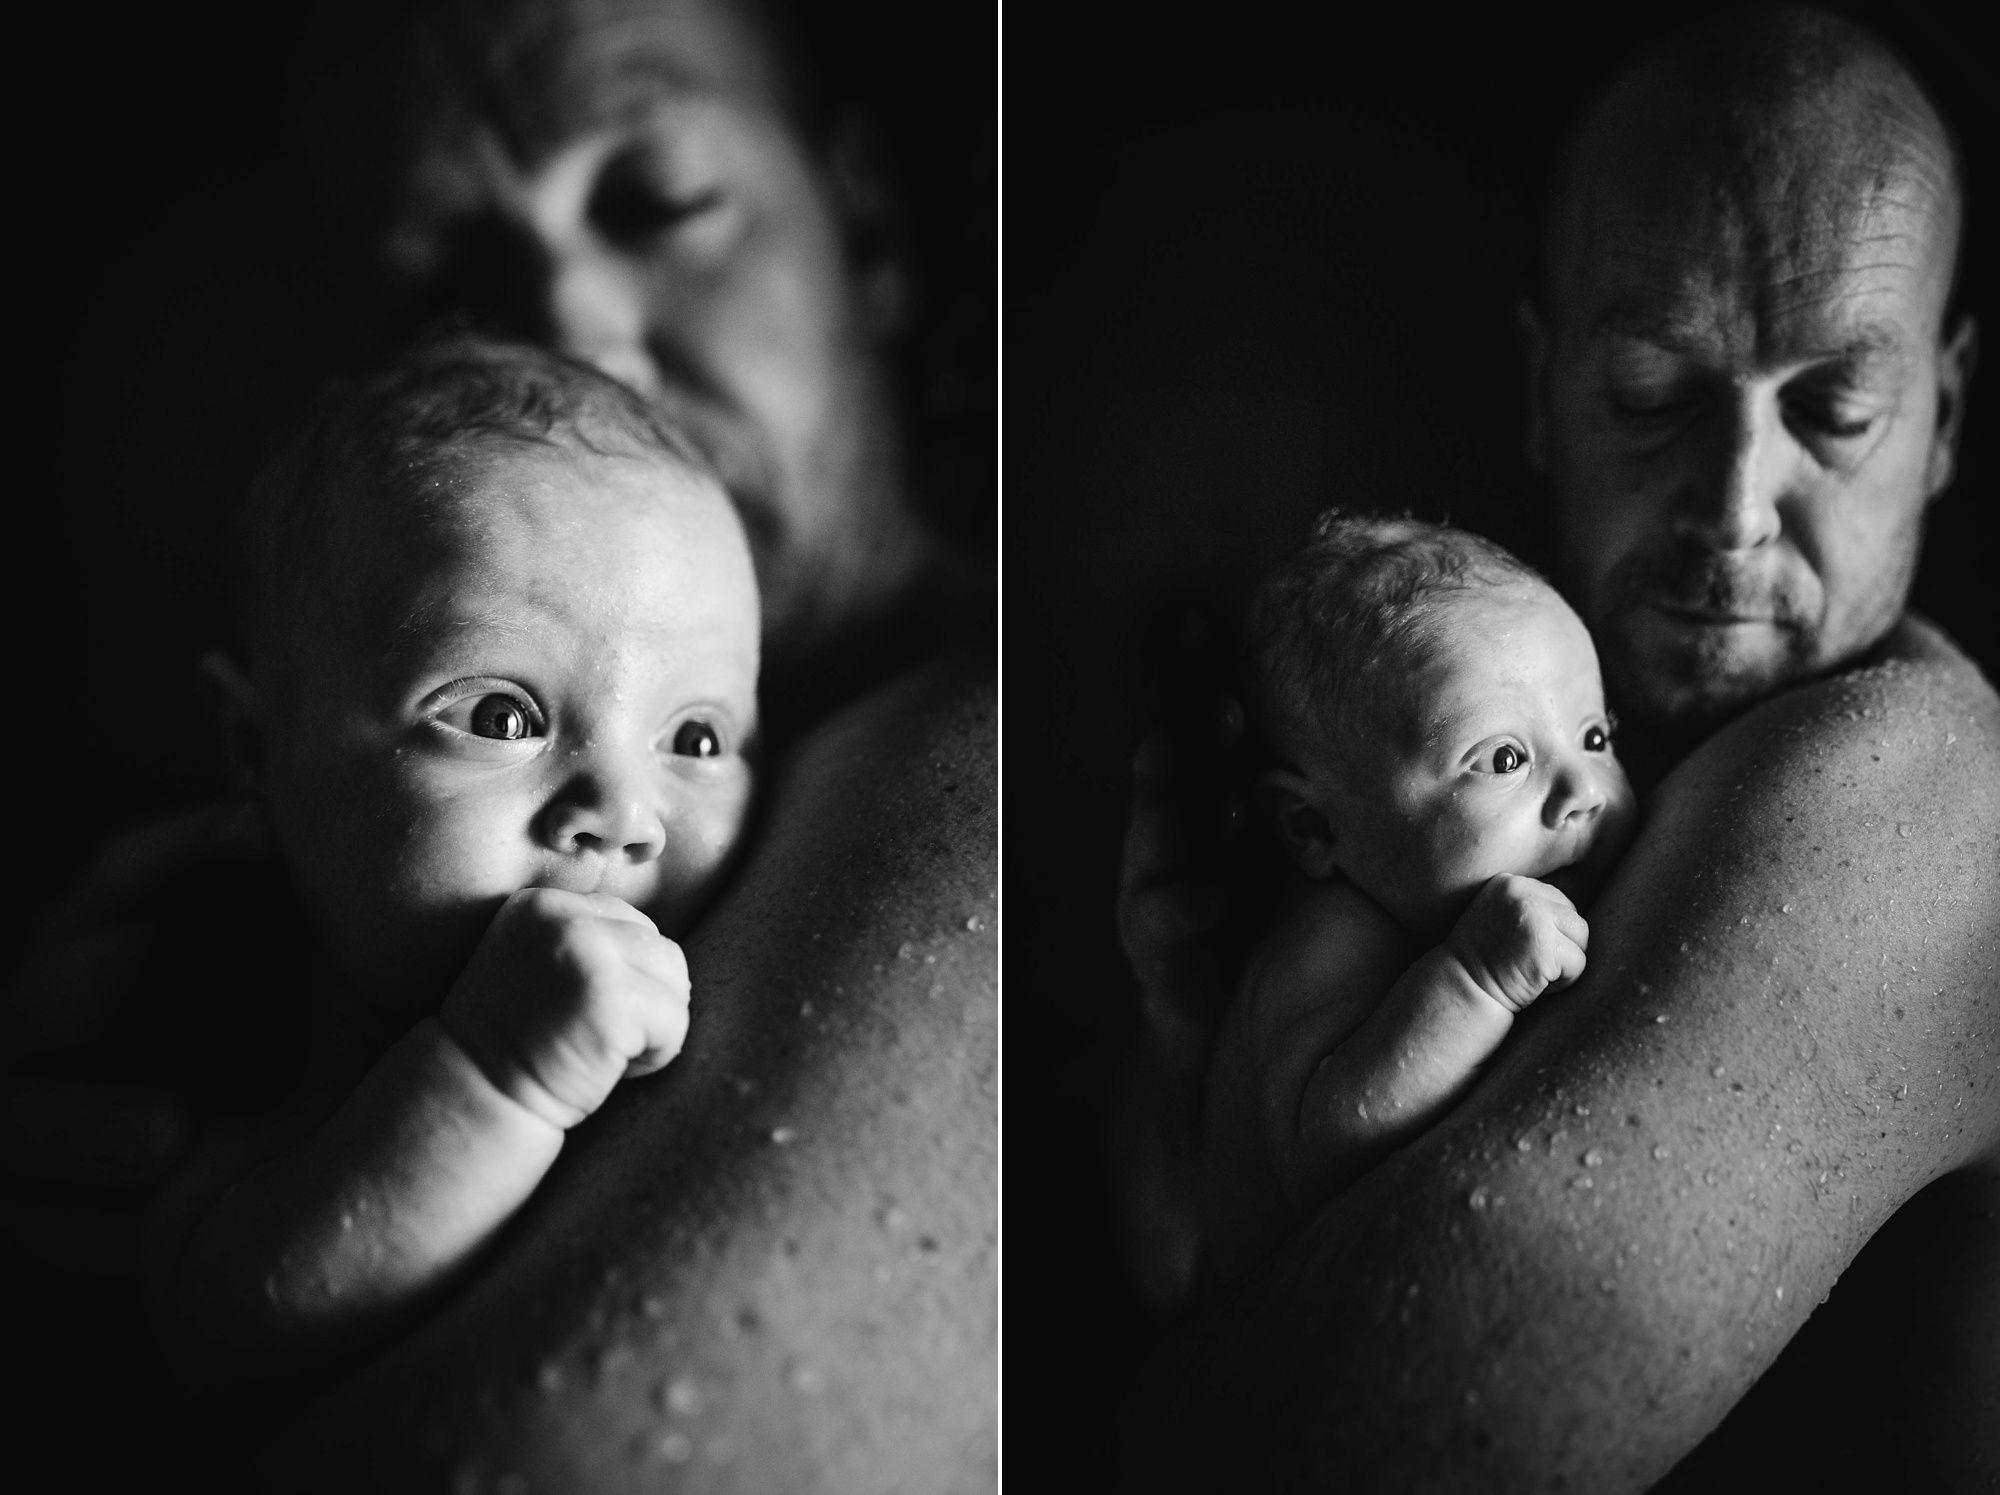 newbornfotografie-arnhem-fotograaf-newborn-_0008.jpg